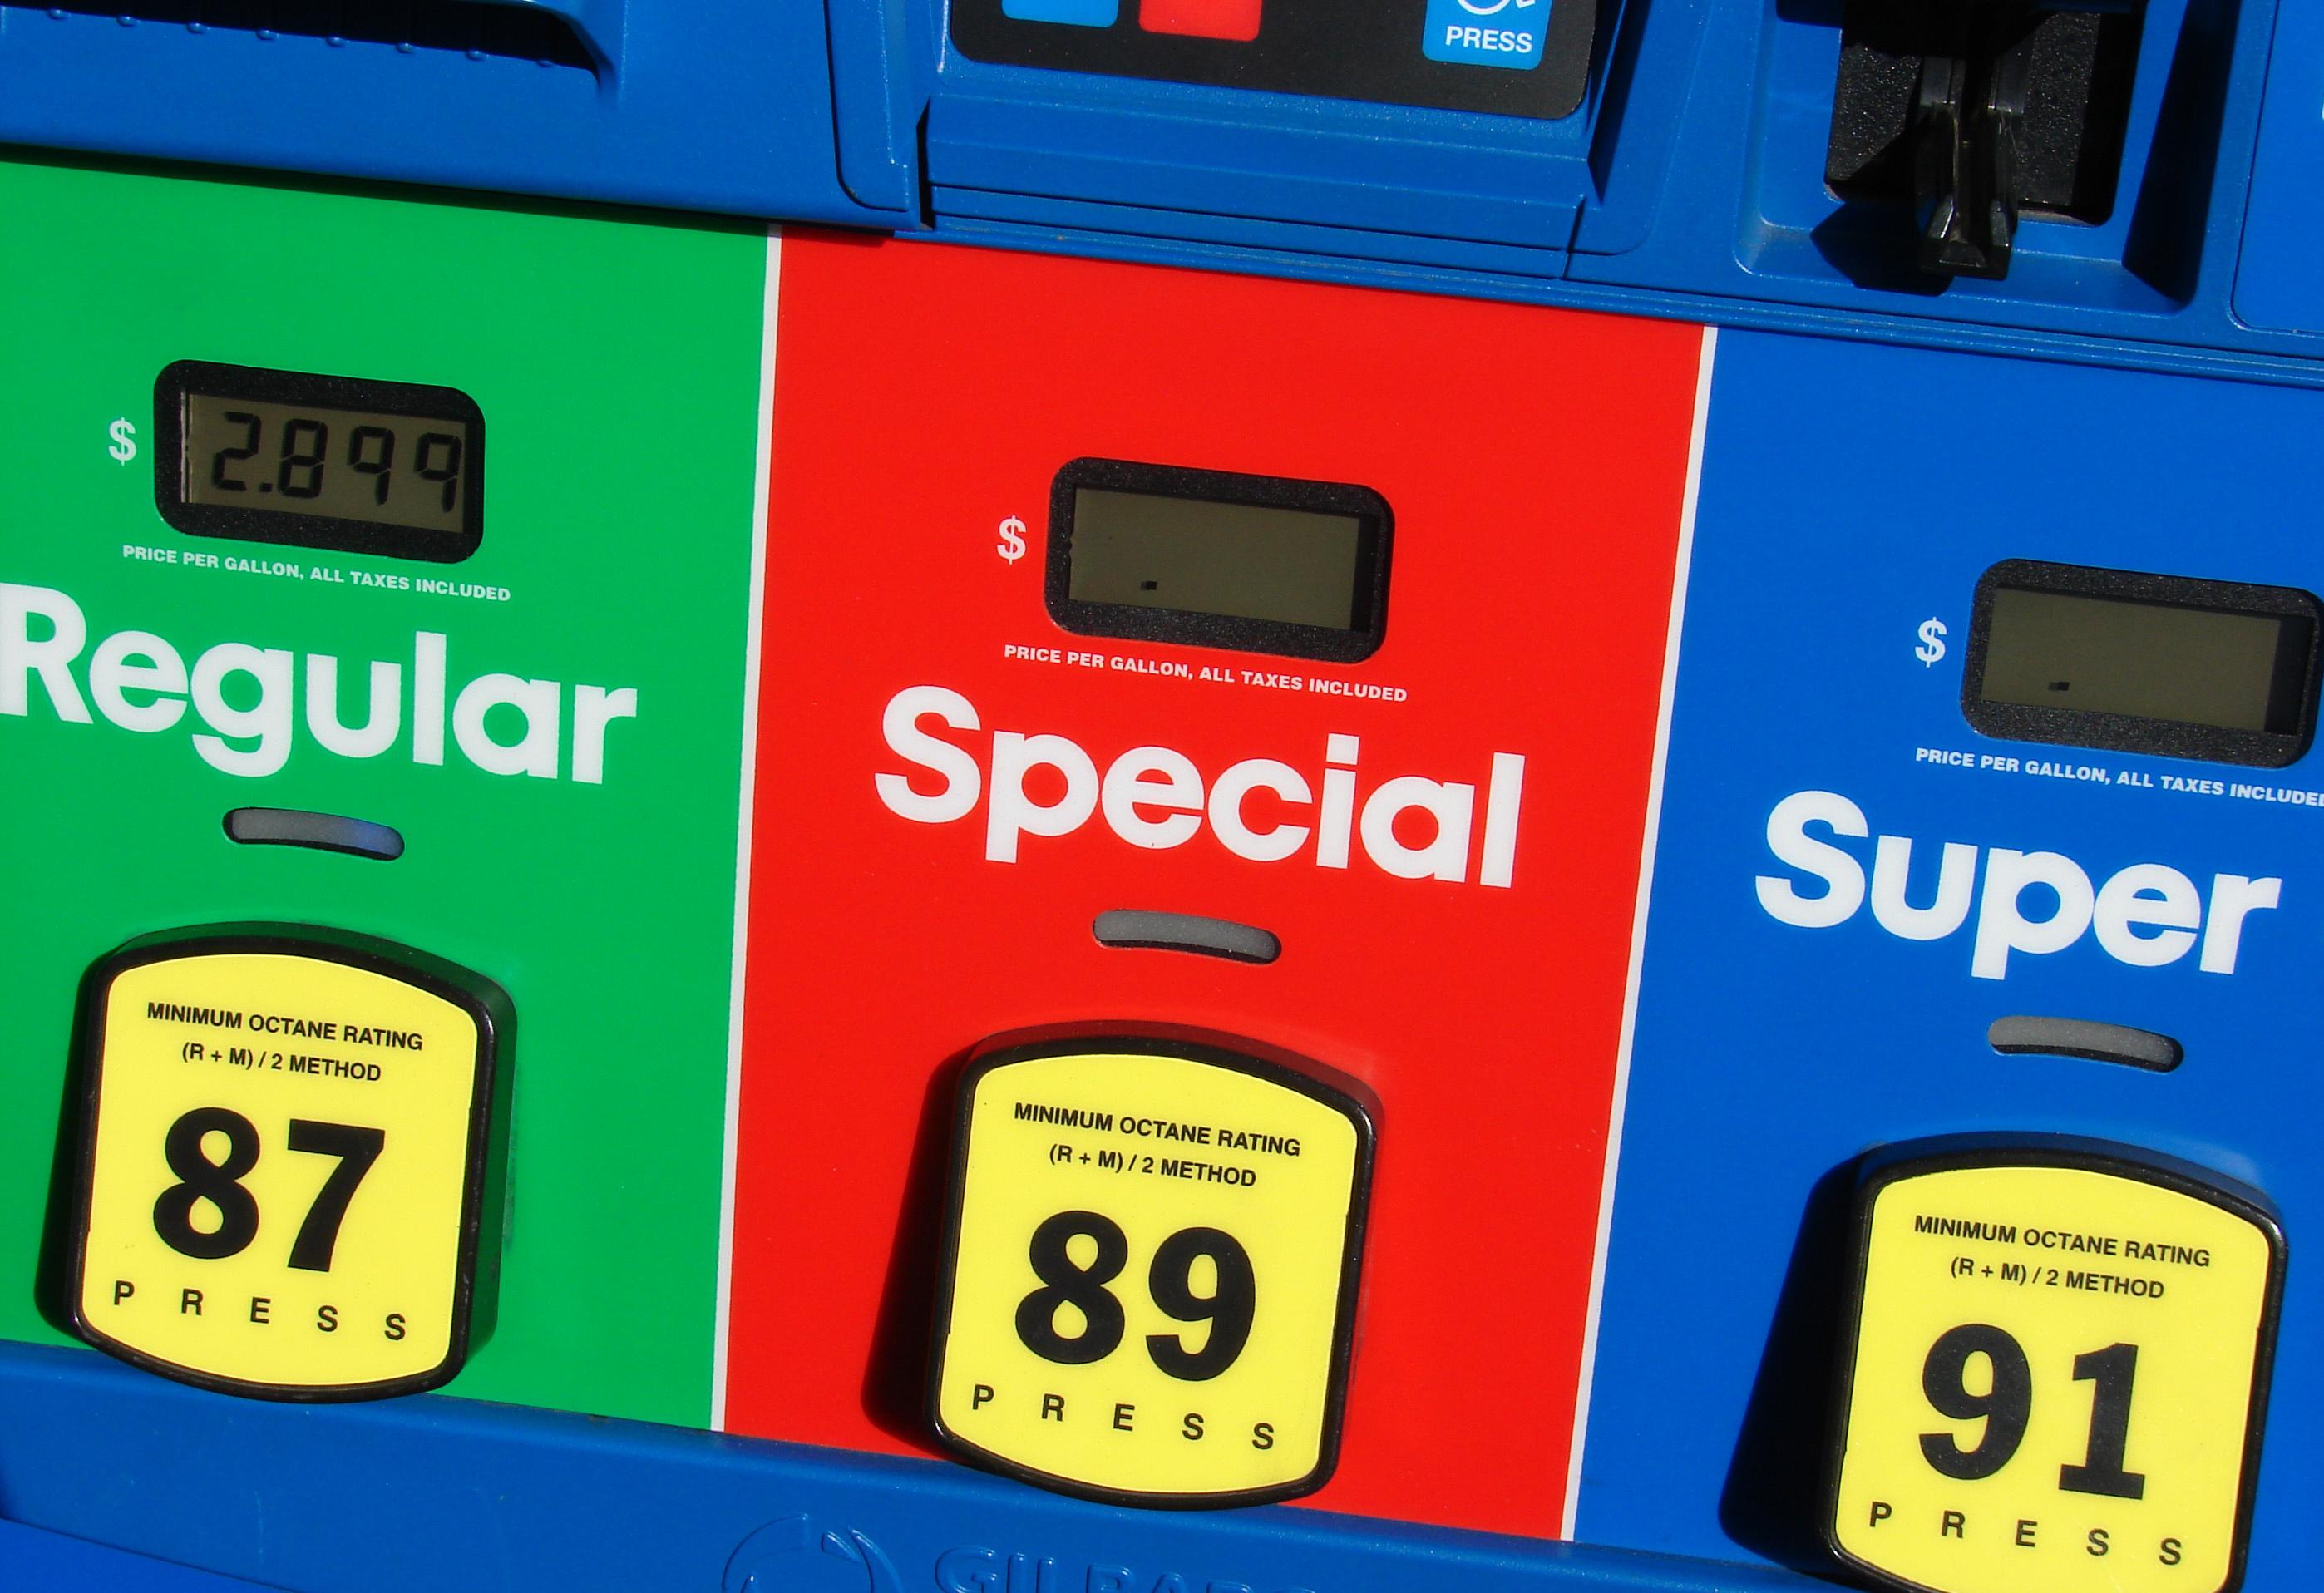 High Octane Ethanol Blends Needed for Fuel Economy Standards